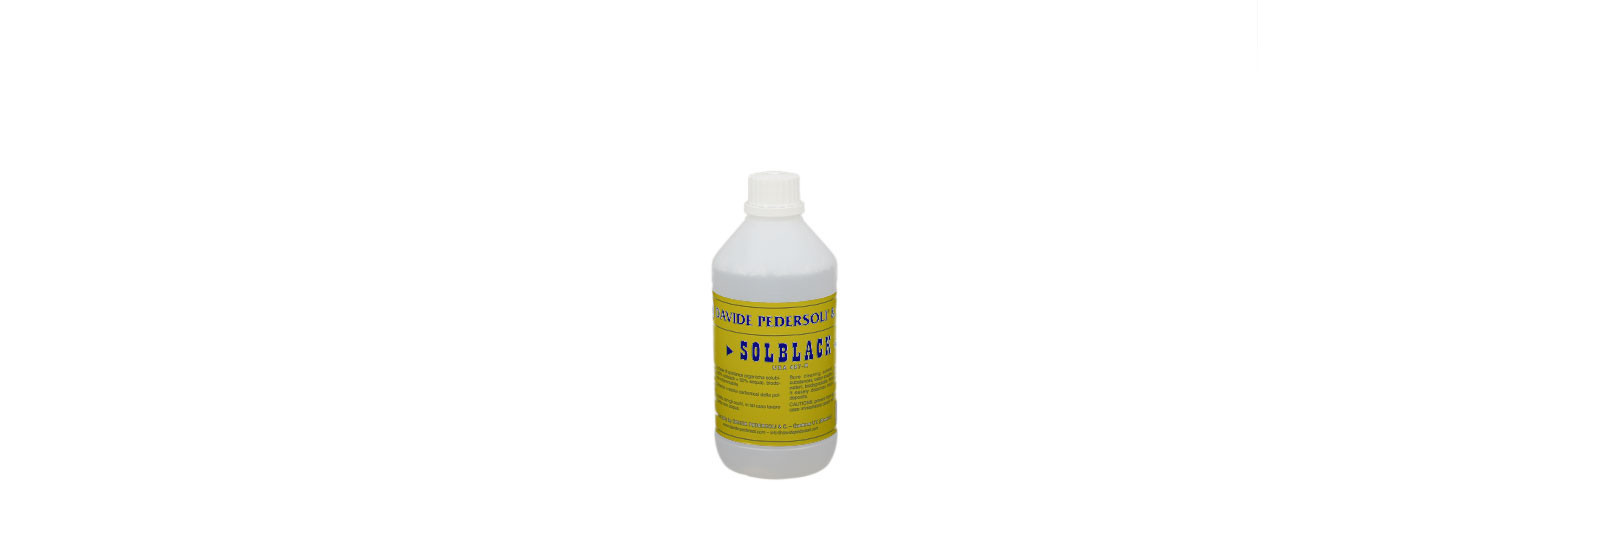 Solblack 500 ml